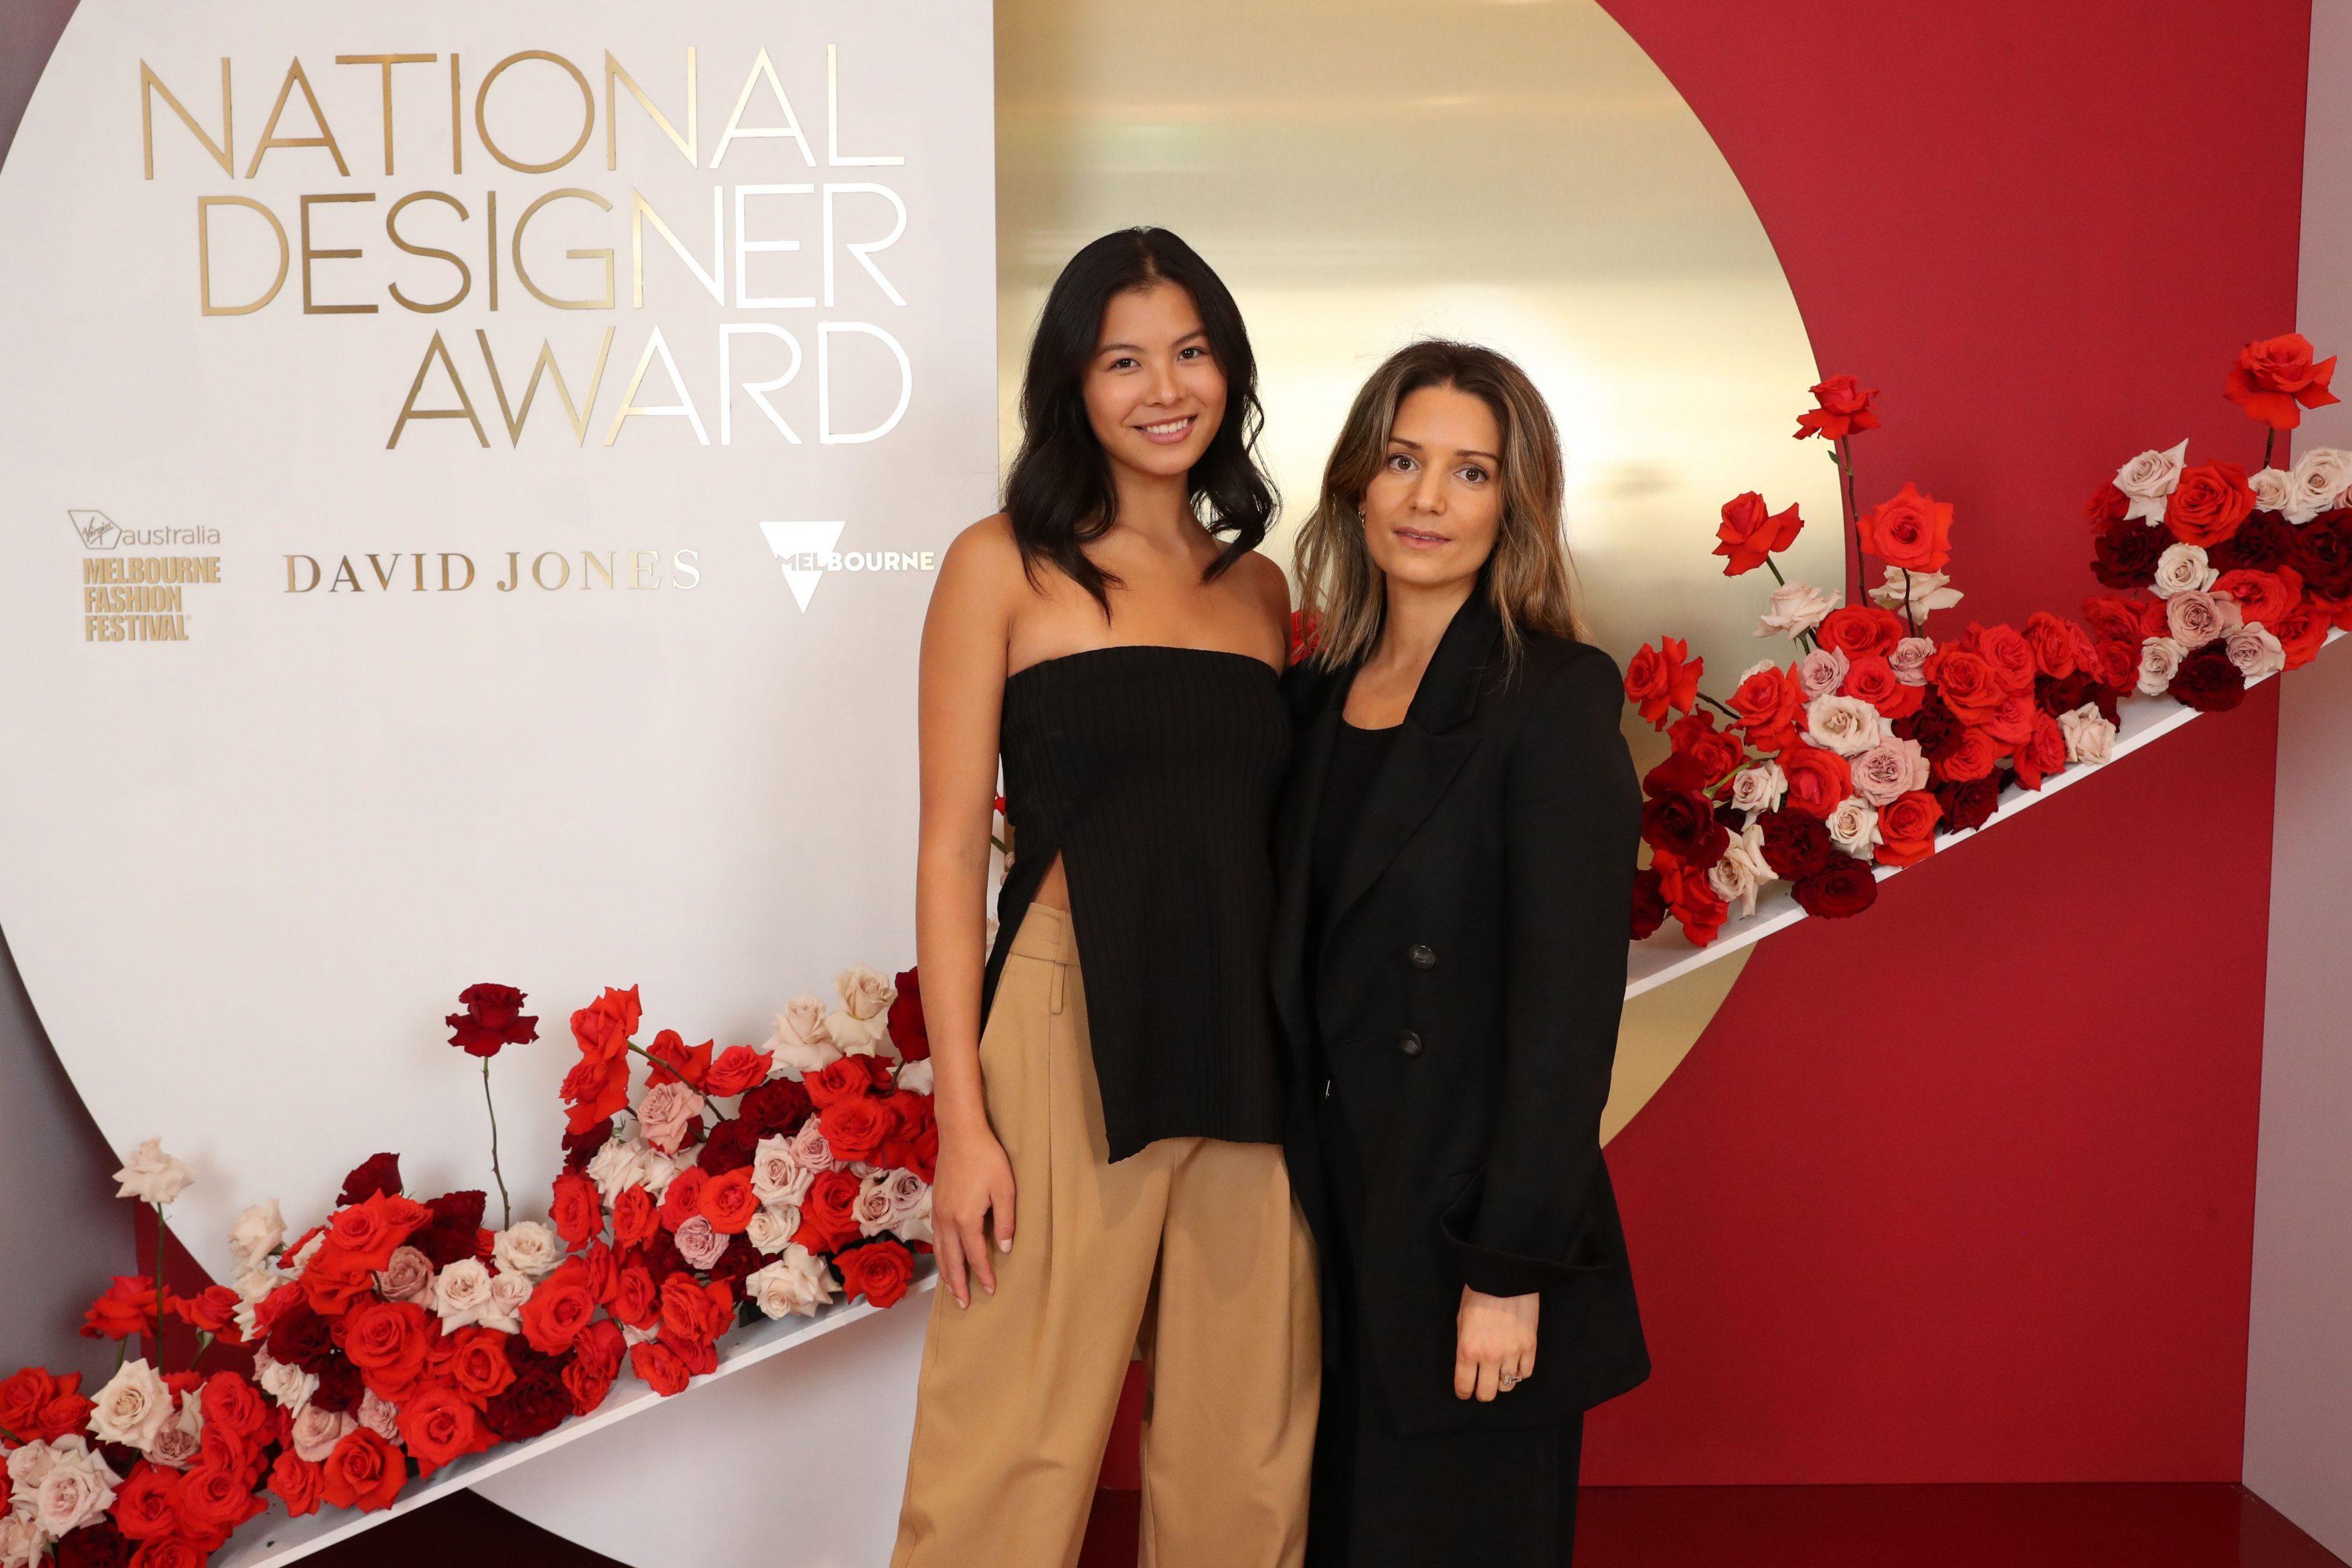 Charlotte Hicks 2020 National Designer Award at the Virgin Australia Melbourne Fashion Festival.